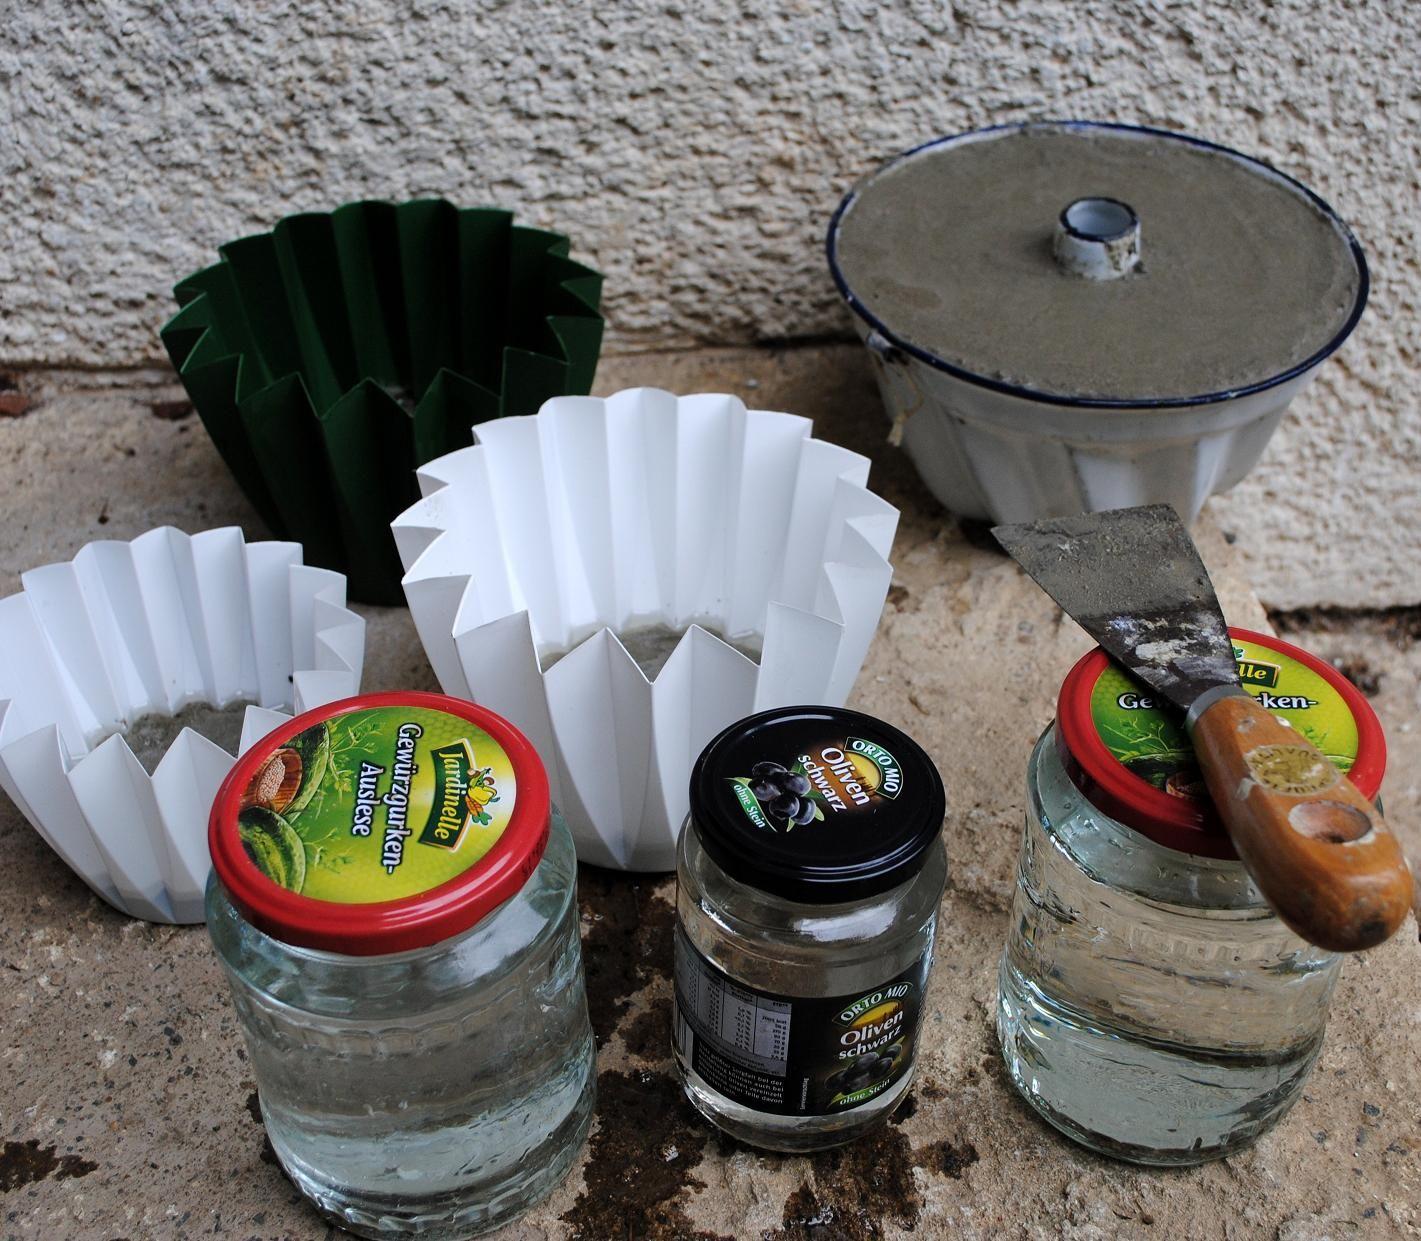 Gartendeko-Blog: Selbstgemachtes aus Zement | Beton | Pinterest ...